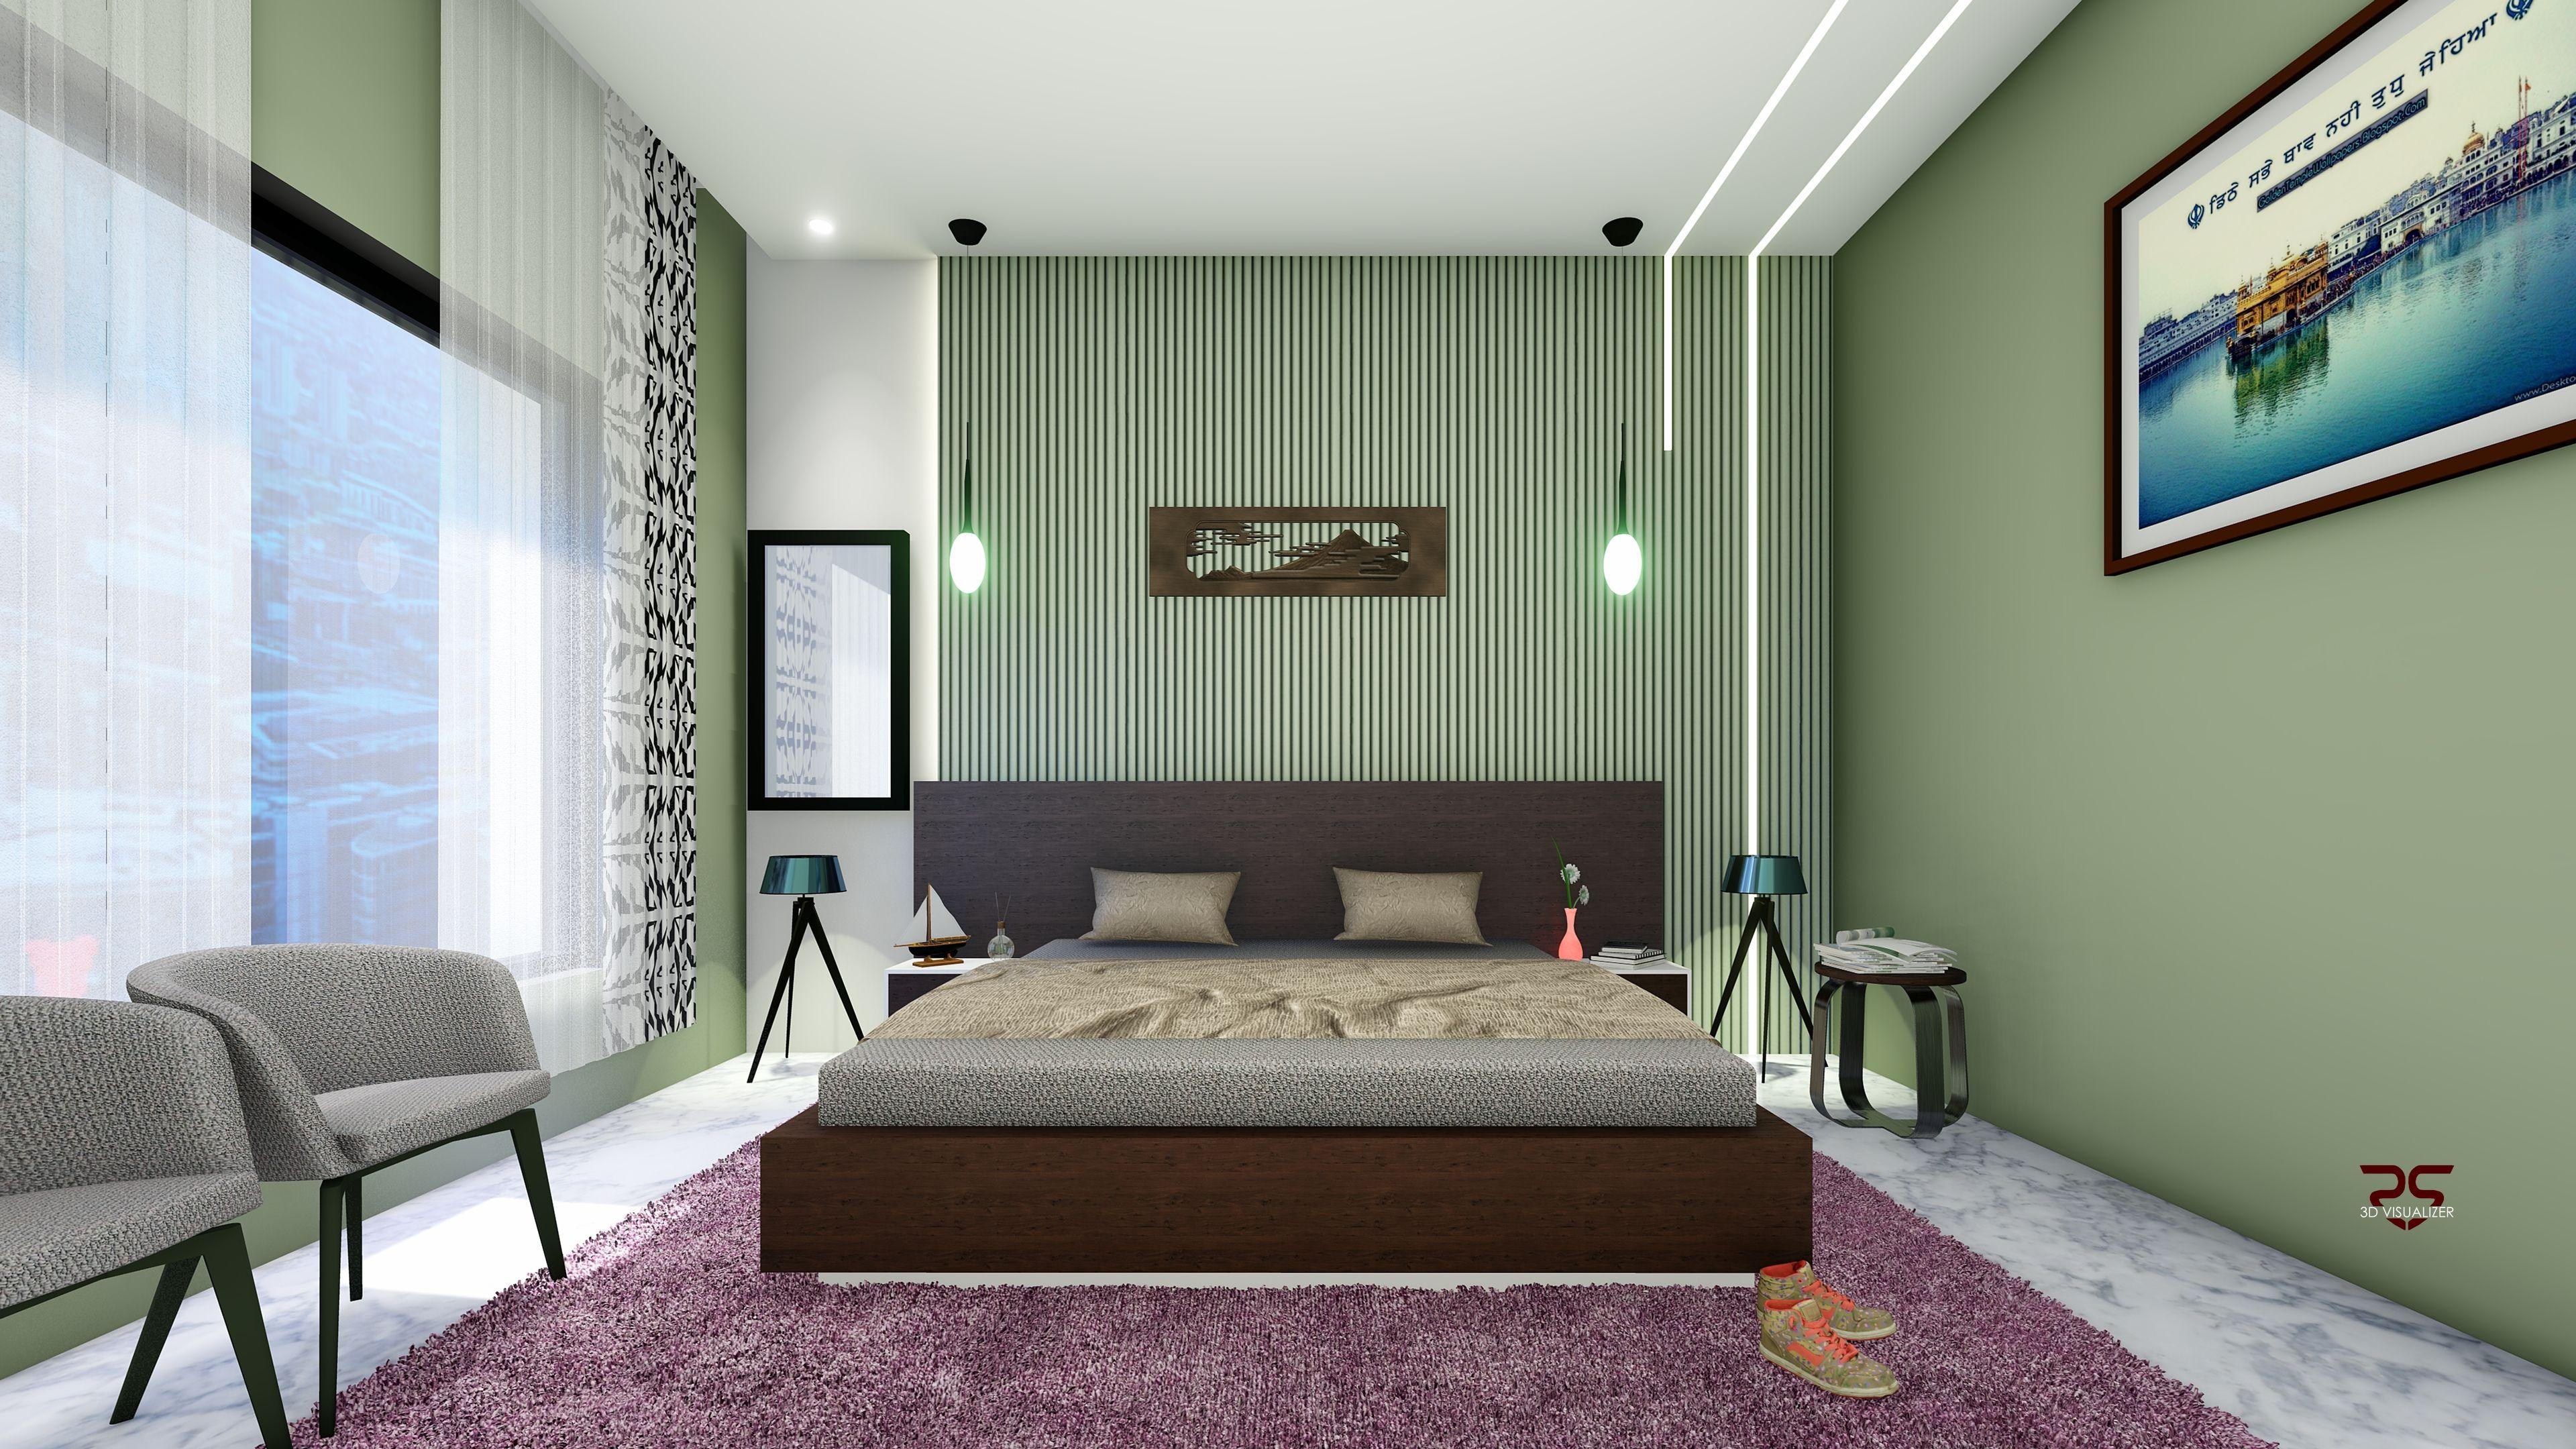 12x14 Feet Bed Room Interior Design Interior Design Layout Modern Bedroom Design Room Interior Design Room interior design photos